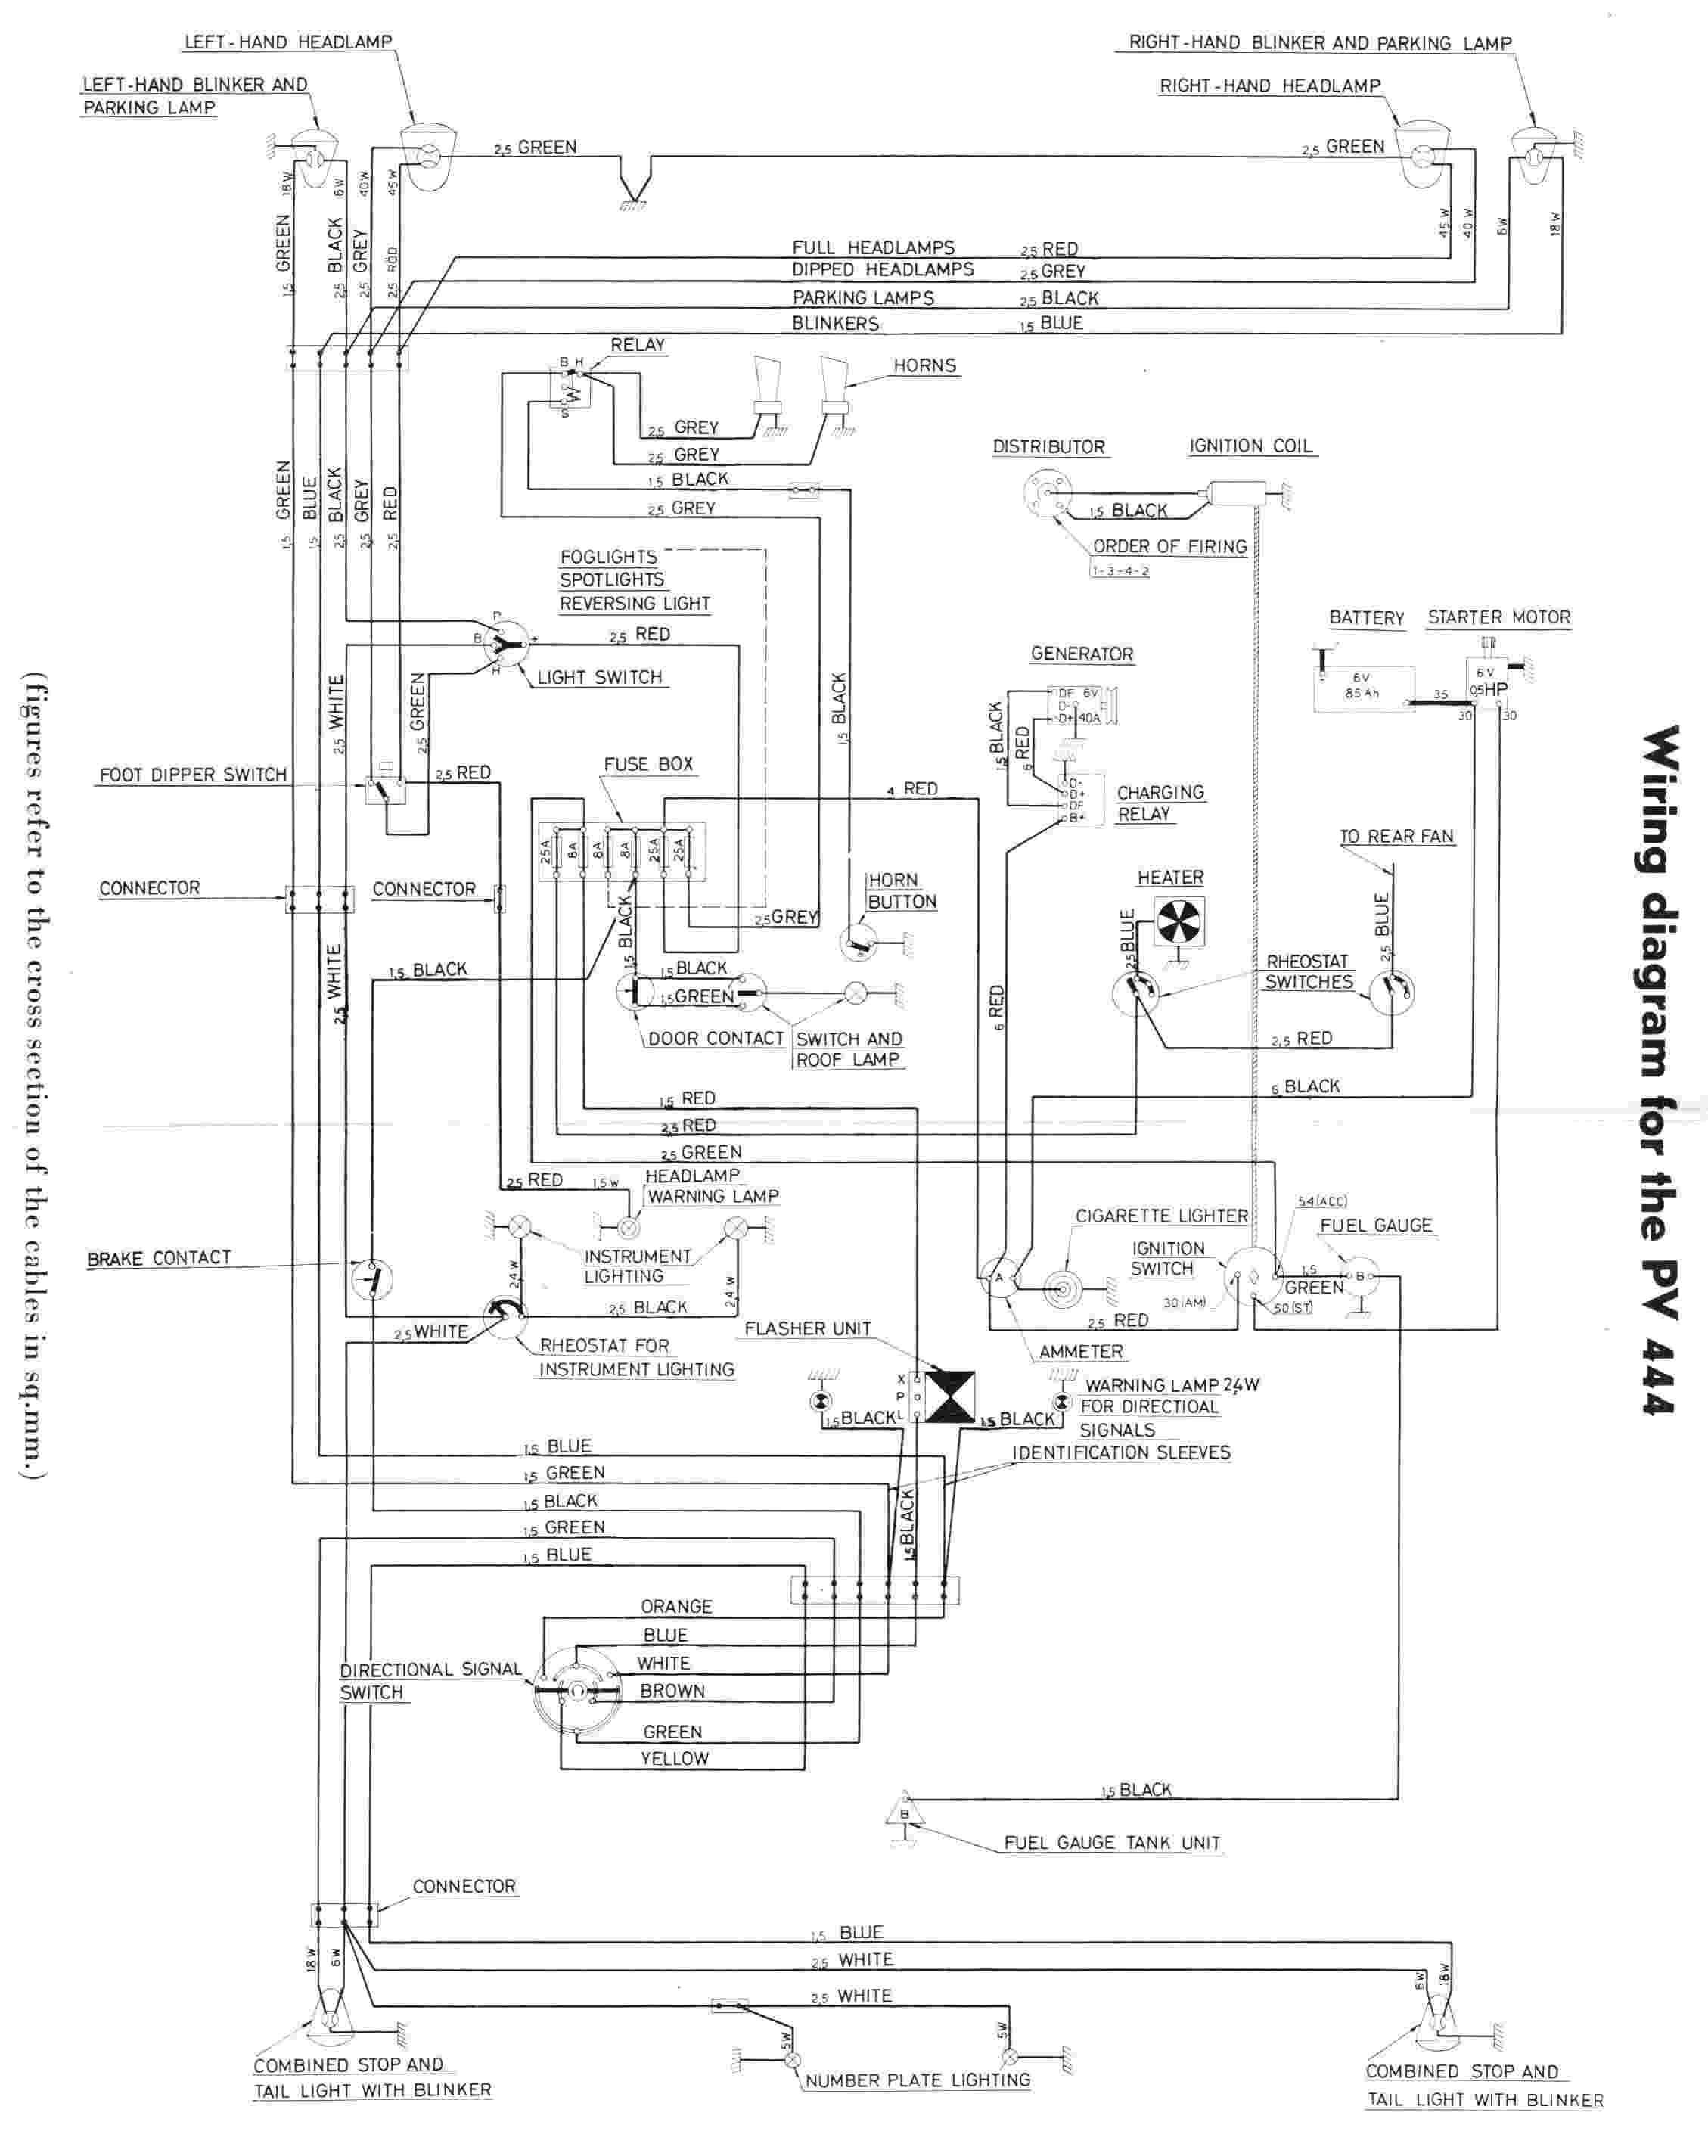 medium resolution of volvo truck electrical diagram trusted wiring diagram online volvo transmission schematic 1993 volvo wiring schematic battery